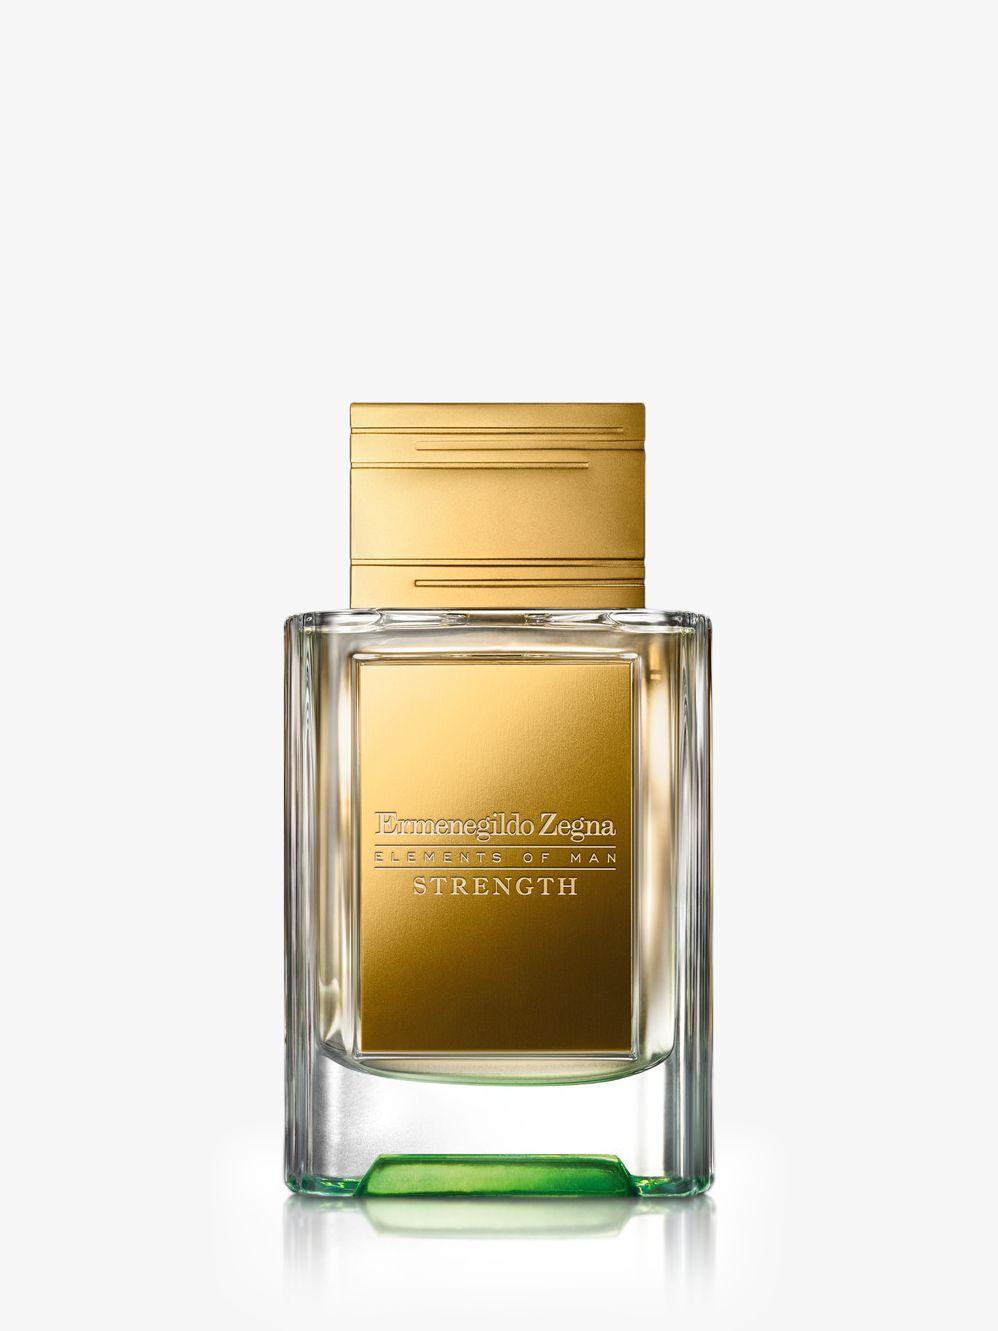 Ermenegildo Zegna Ermenegildo Zegna Elements of Man Strength Concentrate de Parfum, 50ml